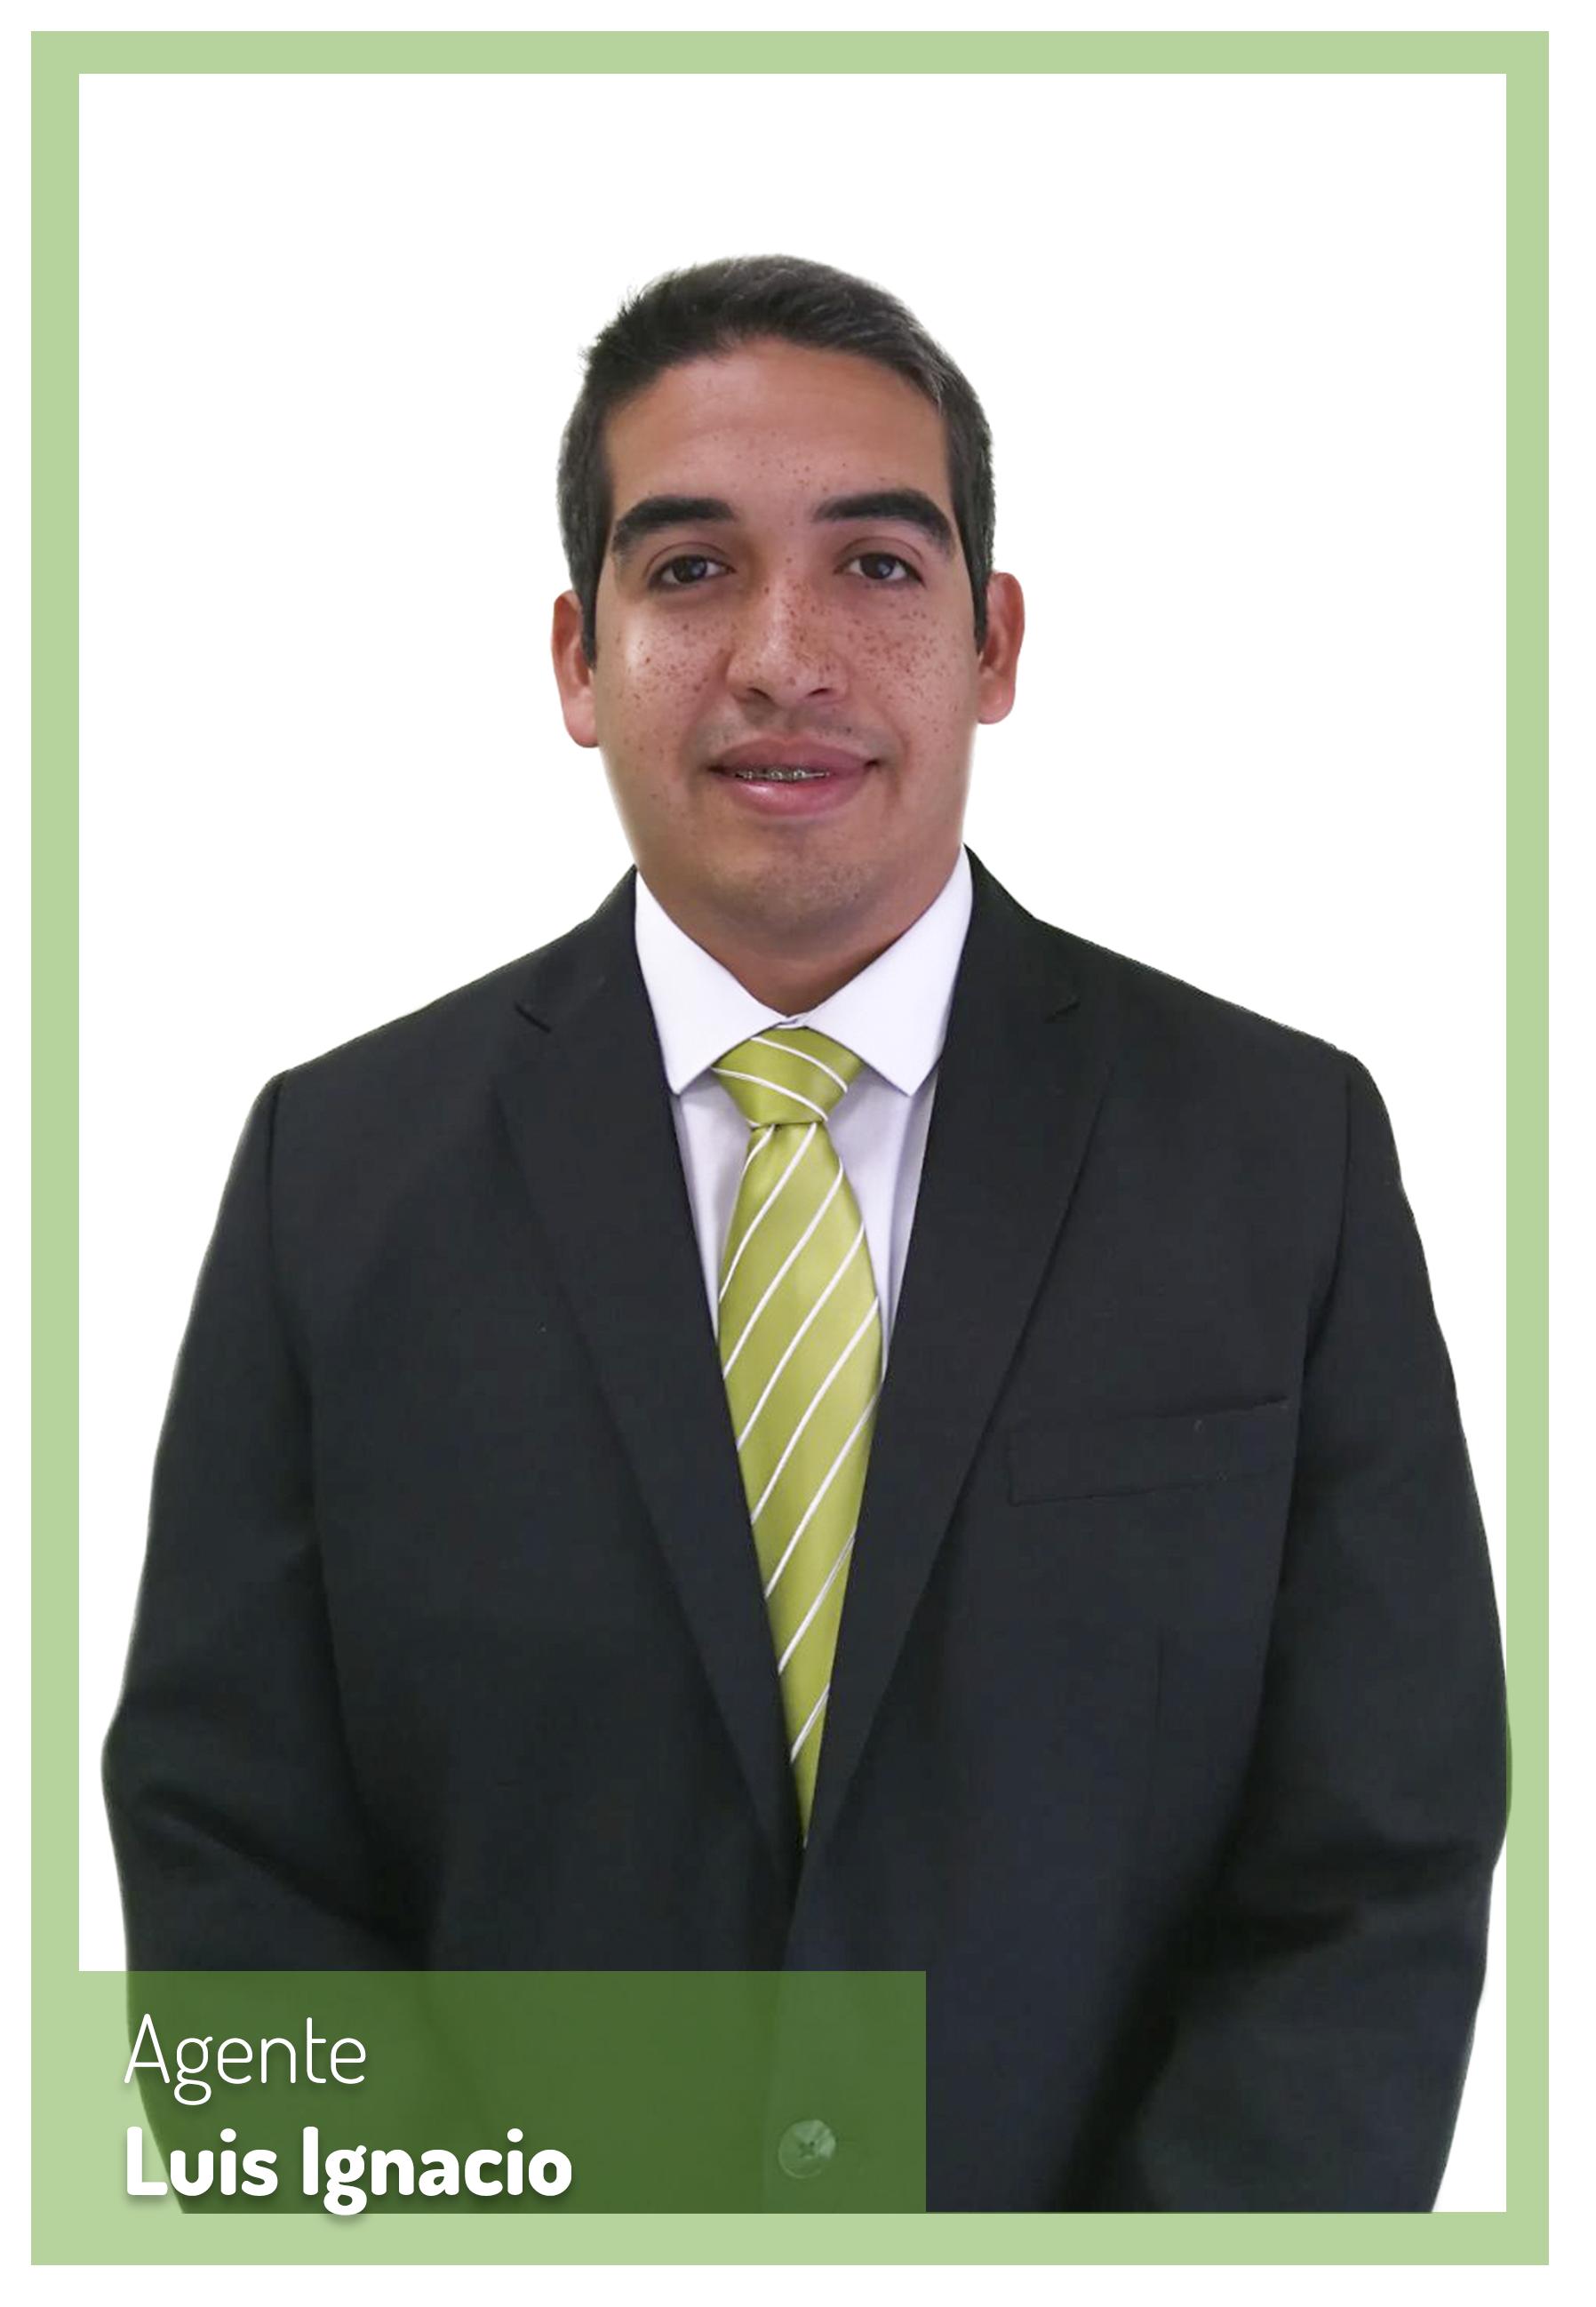 Luis Ignacio asesor Planetacasa Inmobiliaria Malaga